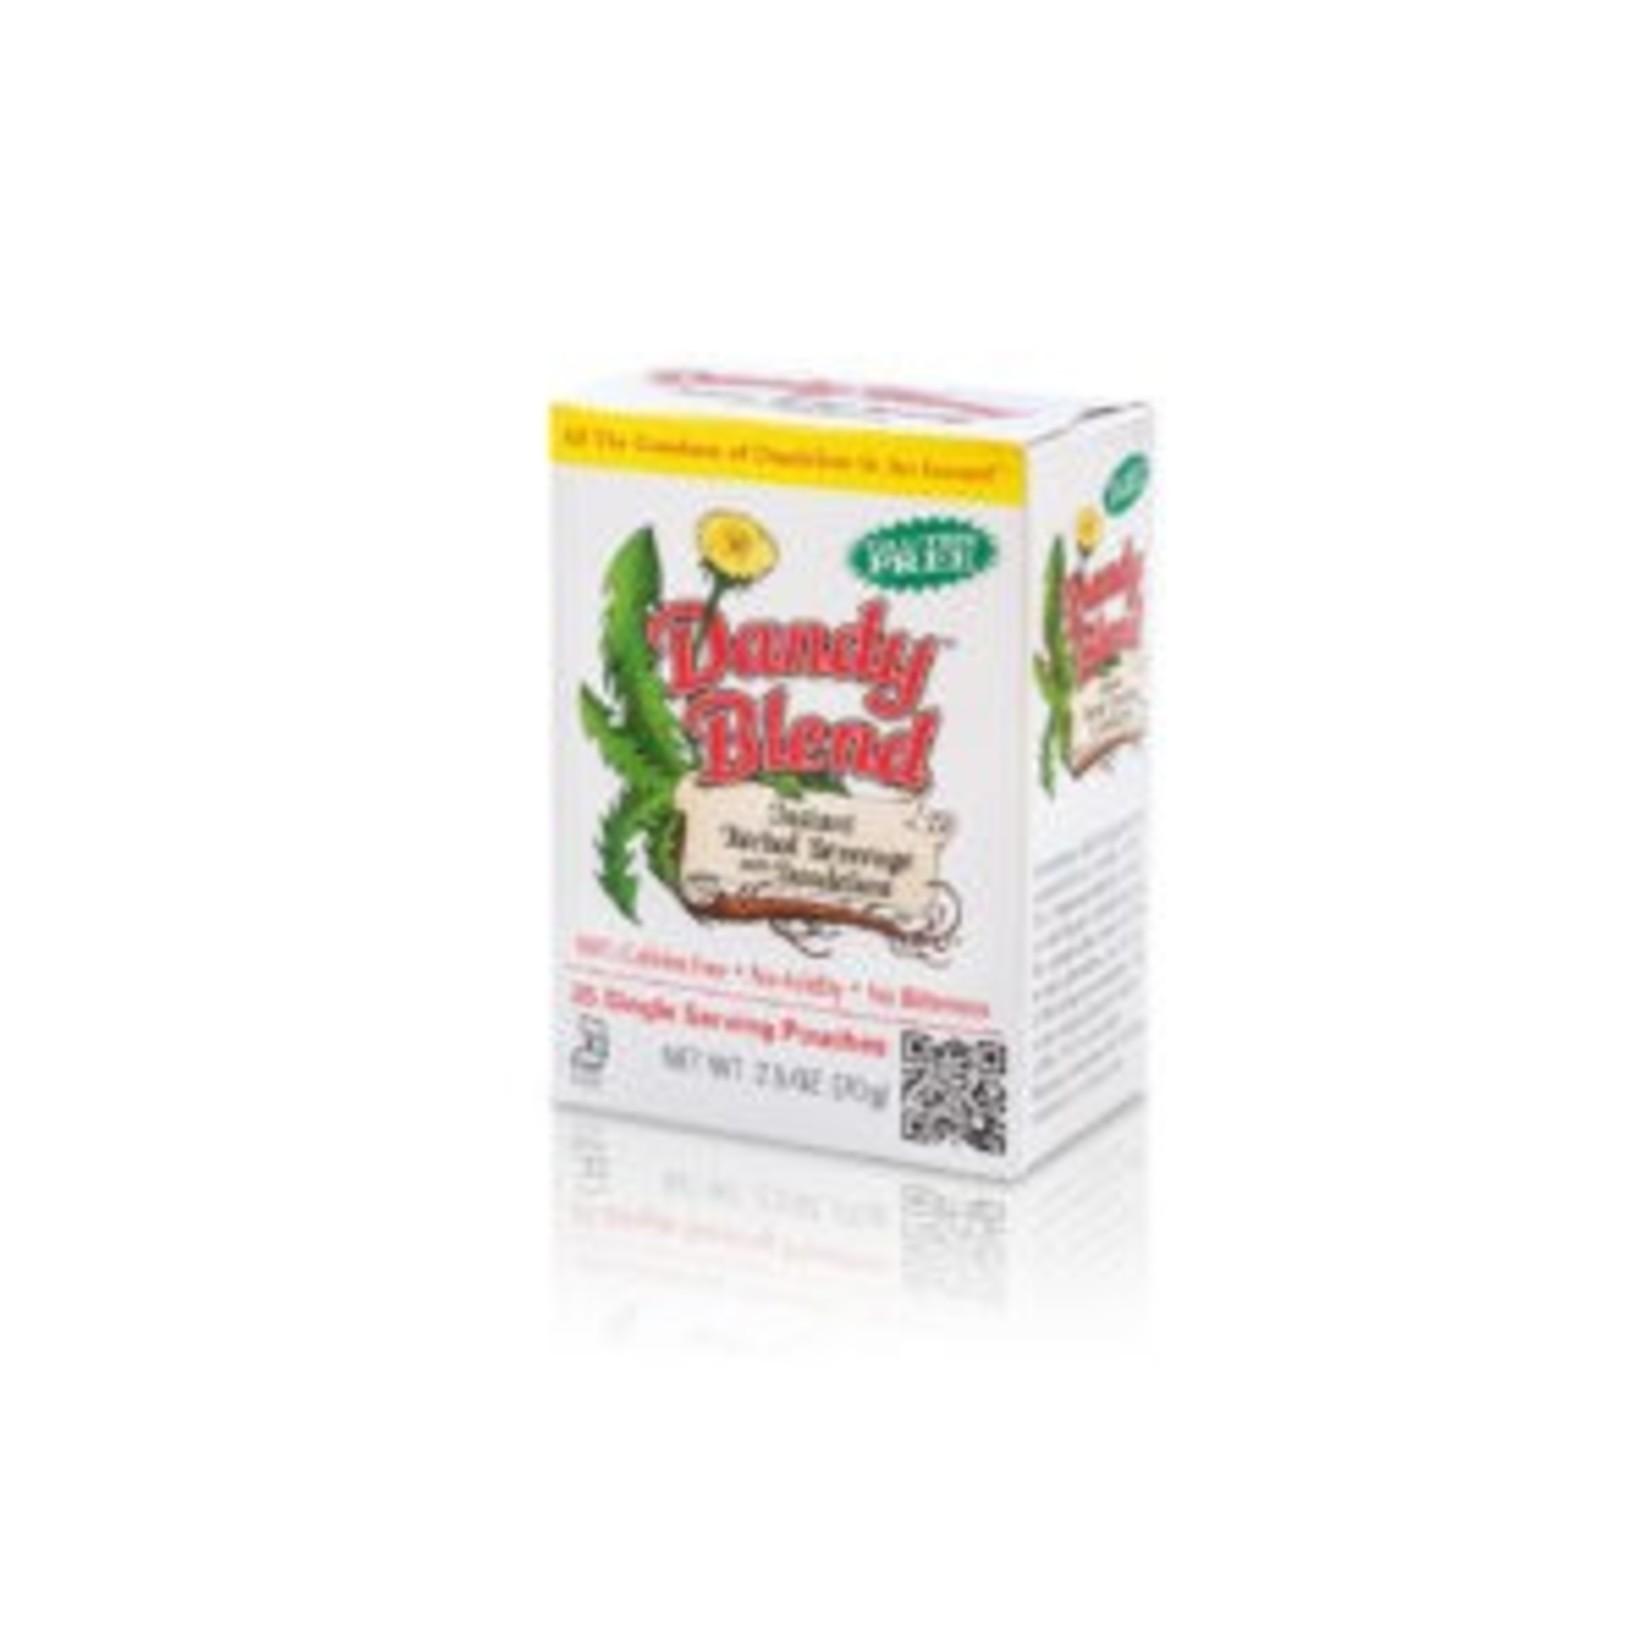 Dandy Blend Instant Dandelion Beverage Herbal Coffee 25 pouches